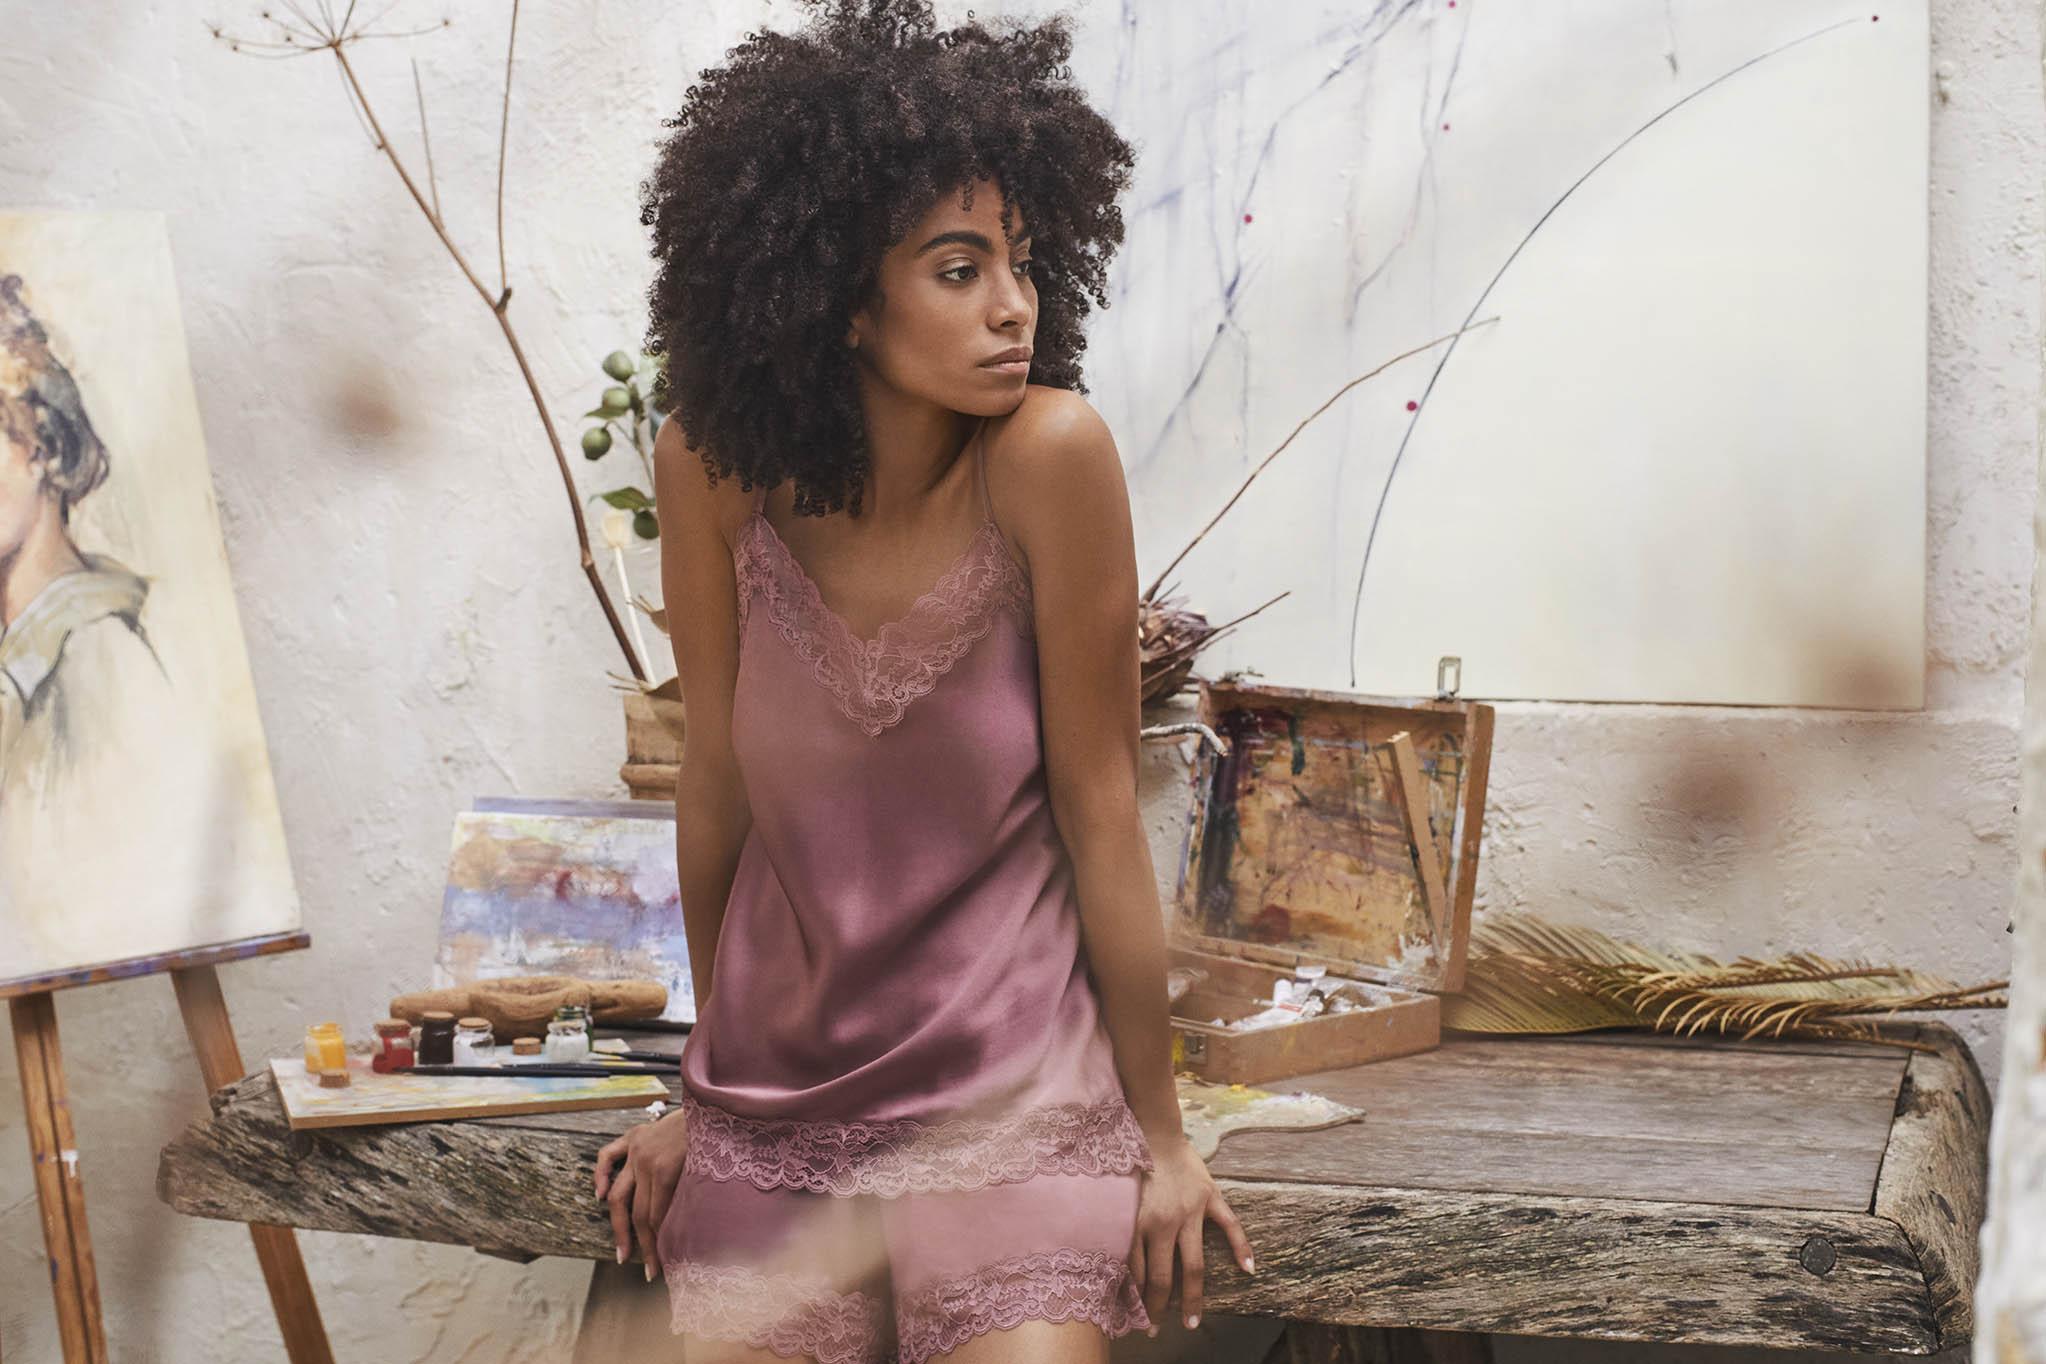 reportaje fotográfico comercial intimissimi chica pijama rosa encaje